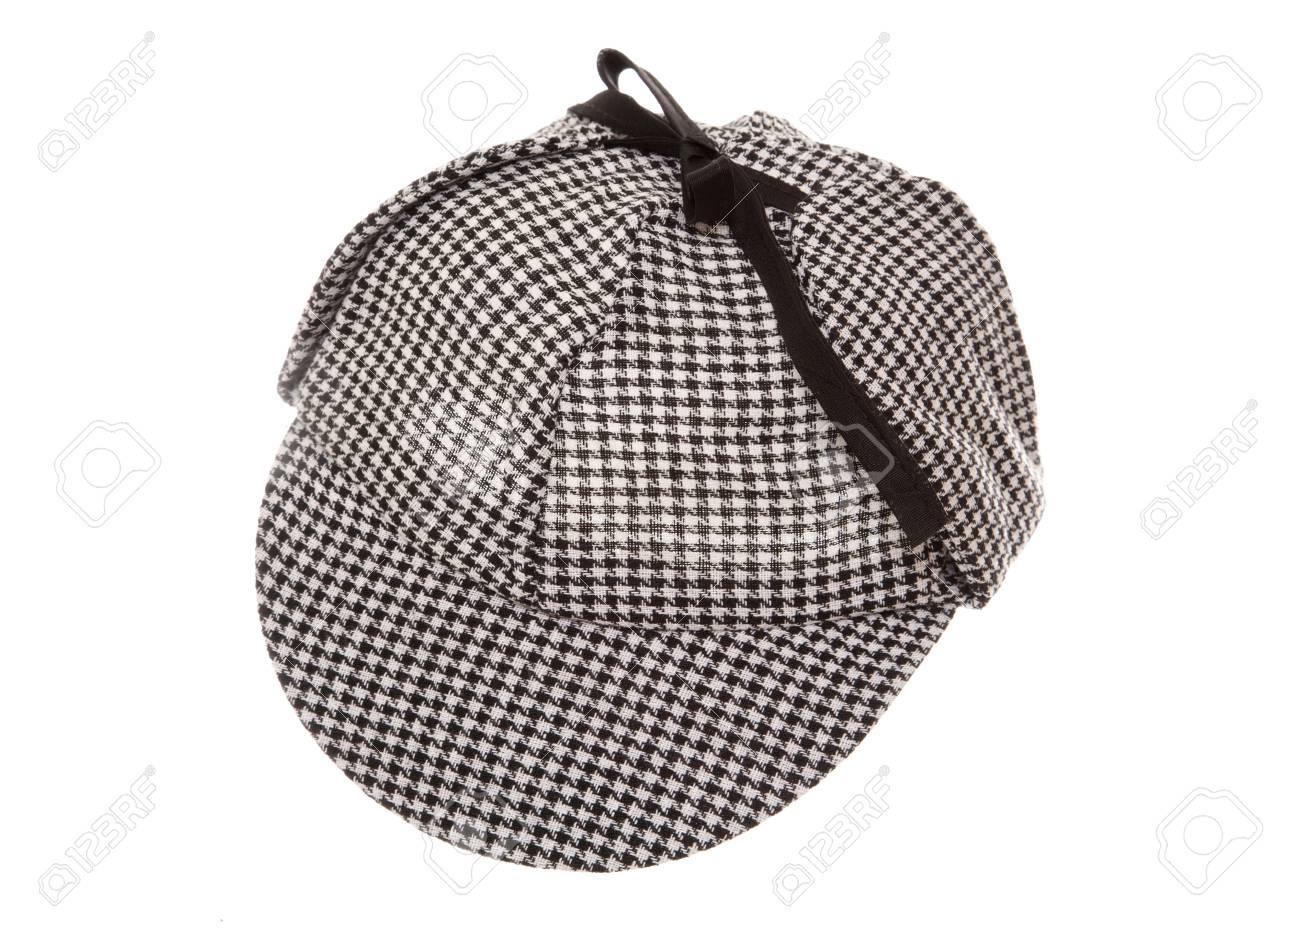 Stock Photo - tweed deerstalker hat studio cutout 7bc578cf978